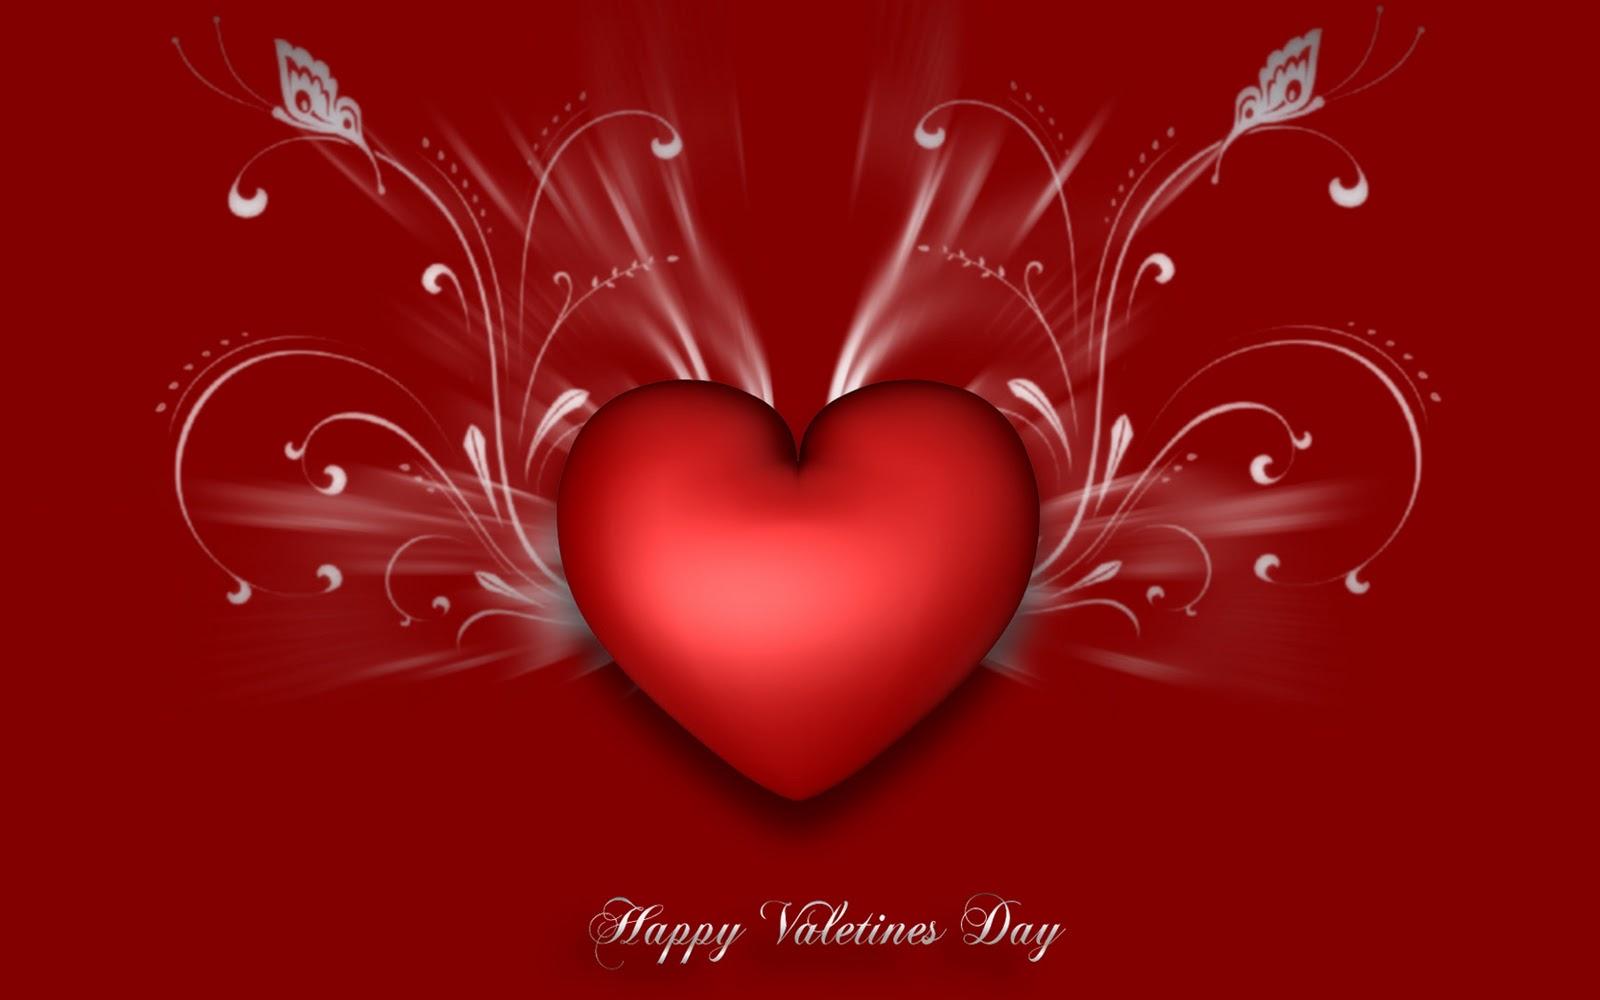 http://4.bp.blogspot.com/-XSAunhoF63Y/TVlMvLD14jI/AAAAAAAAAtM/U6P6oZuWWHI/s1600/Valentine%2527s+day+wallpaper.jpg